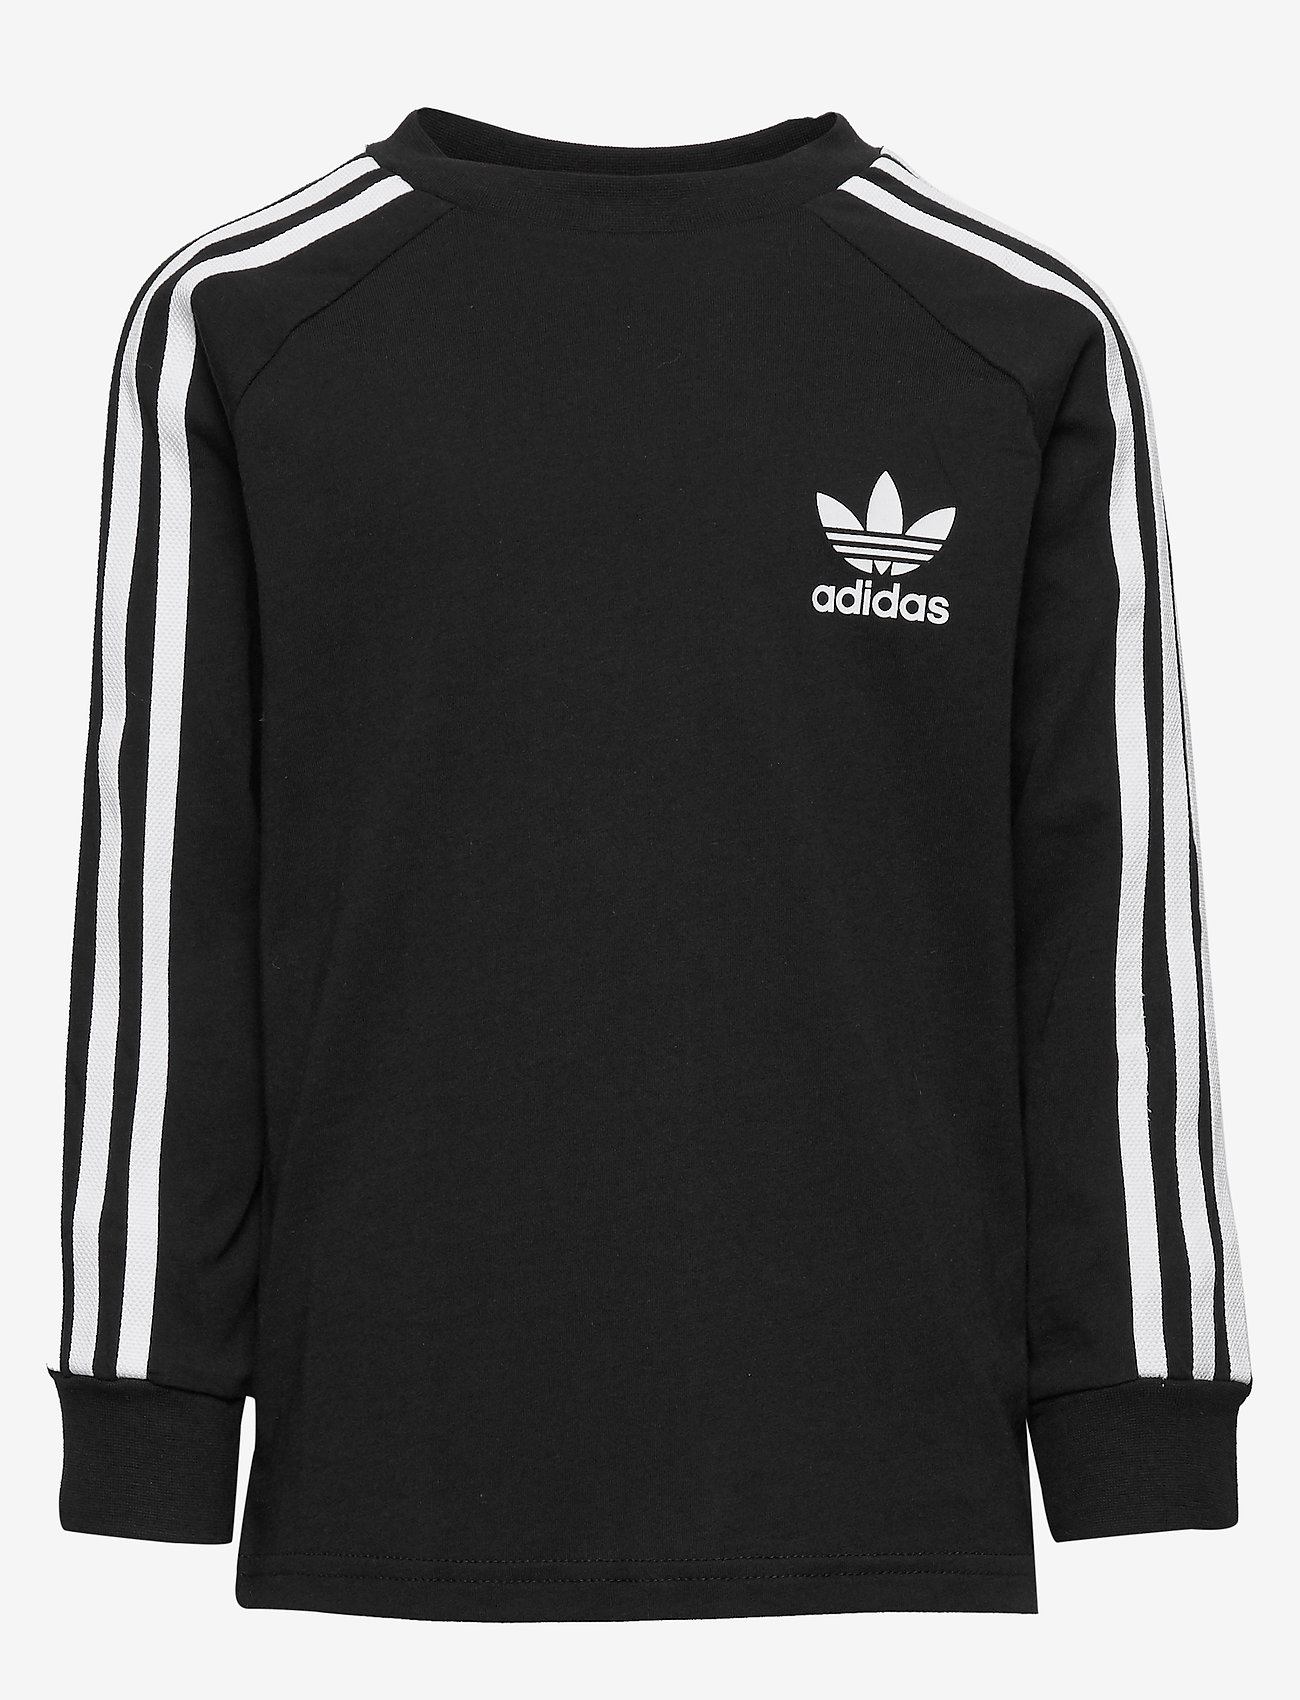 adidas Originals 3-stripes Tee - Long-sleeved t-shirts | Boozt.com